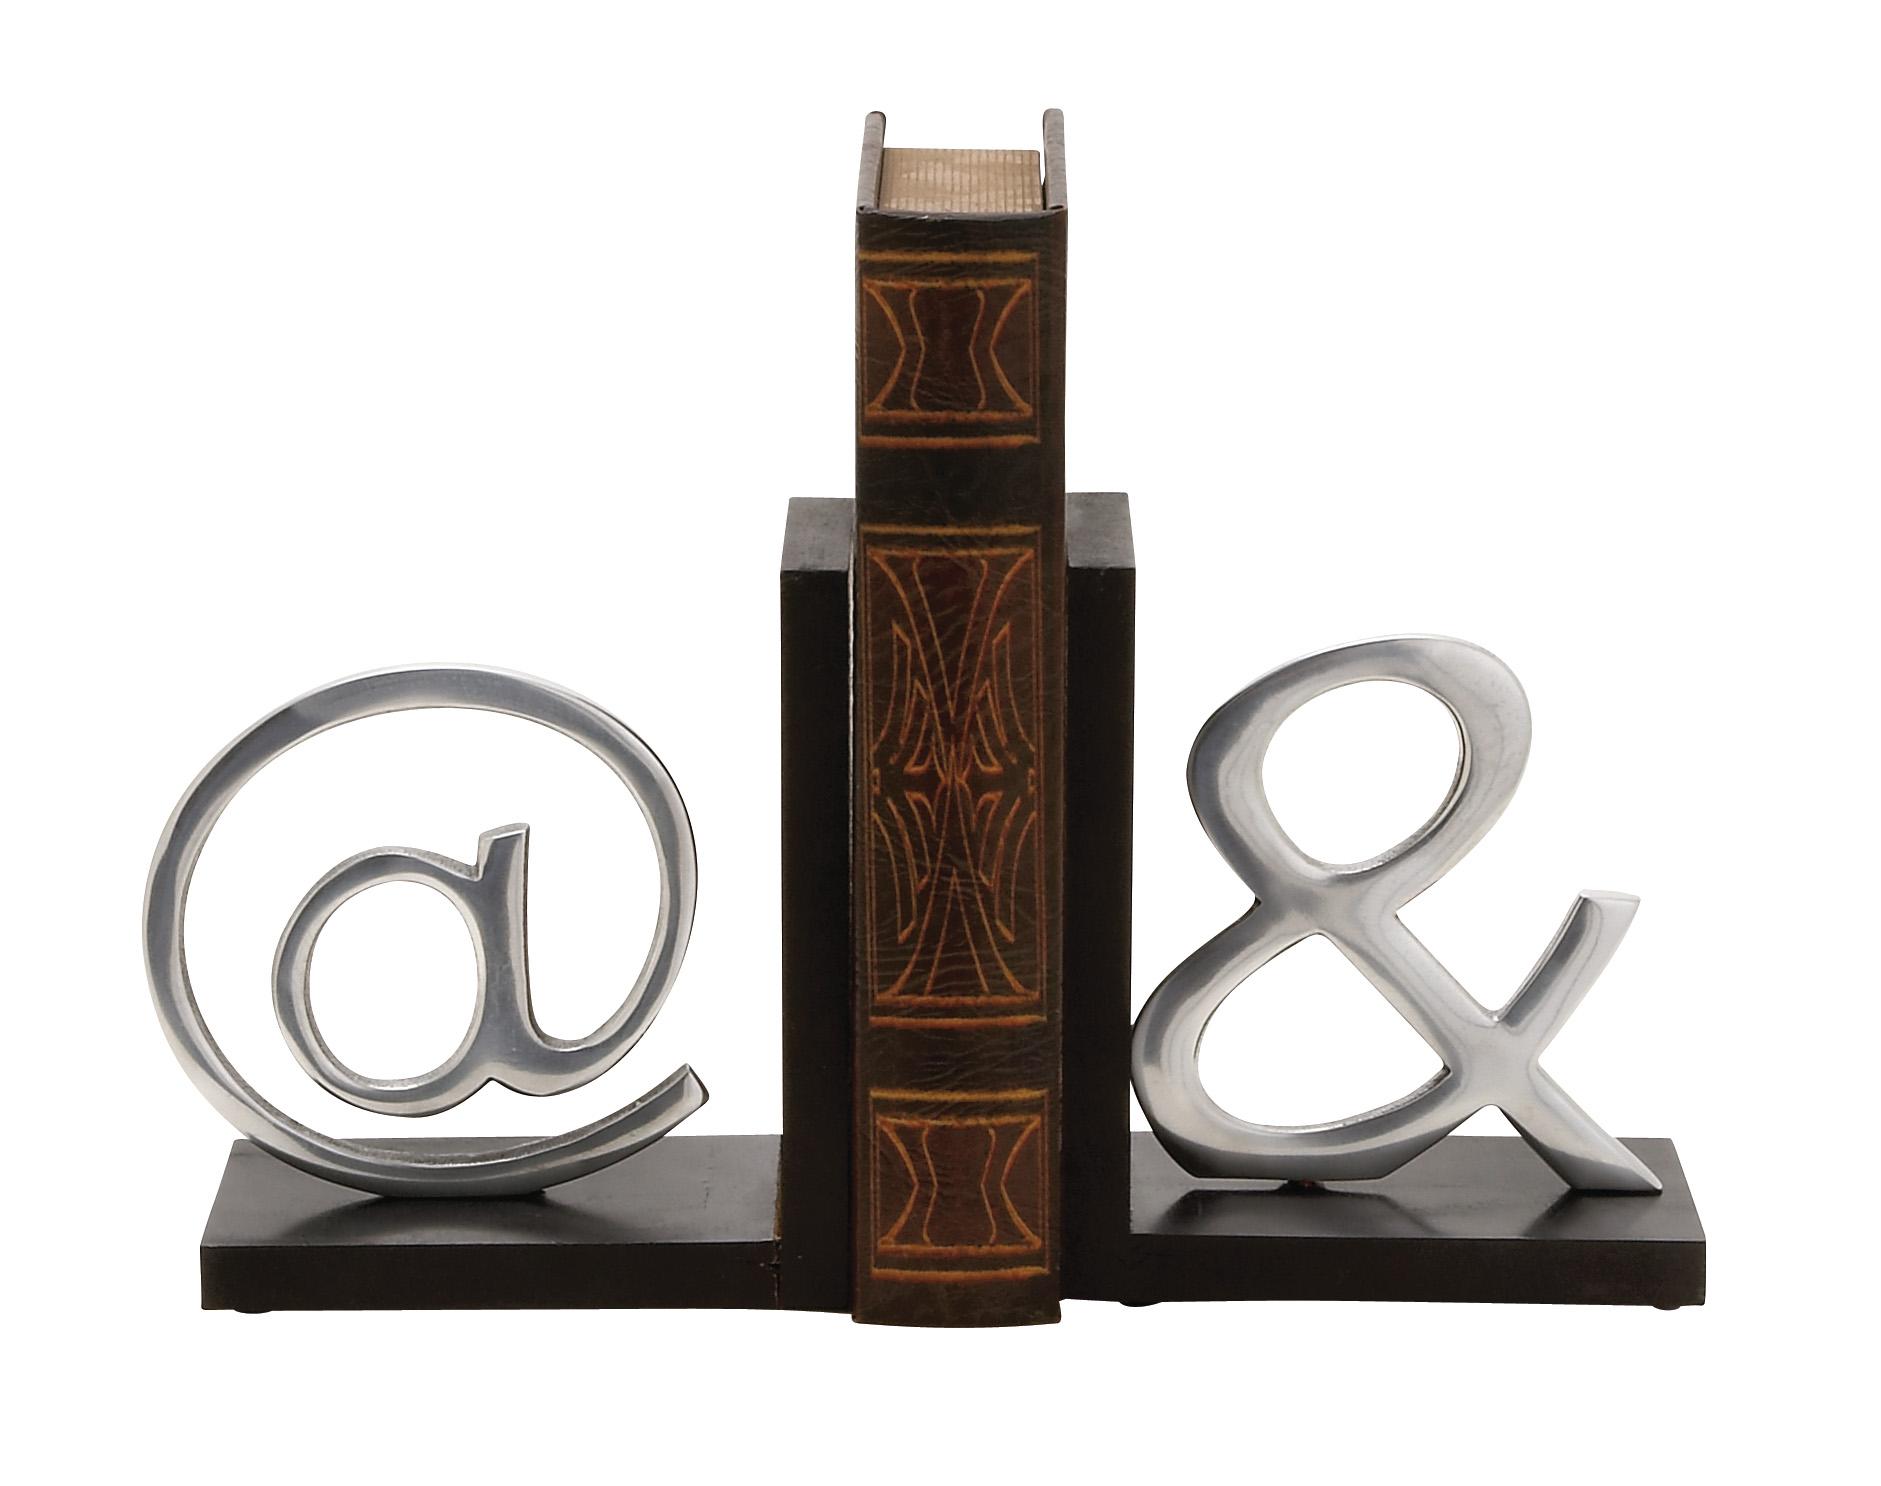 Astounding Wood Aluminium Bookend Pair by Benzara